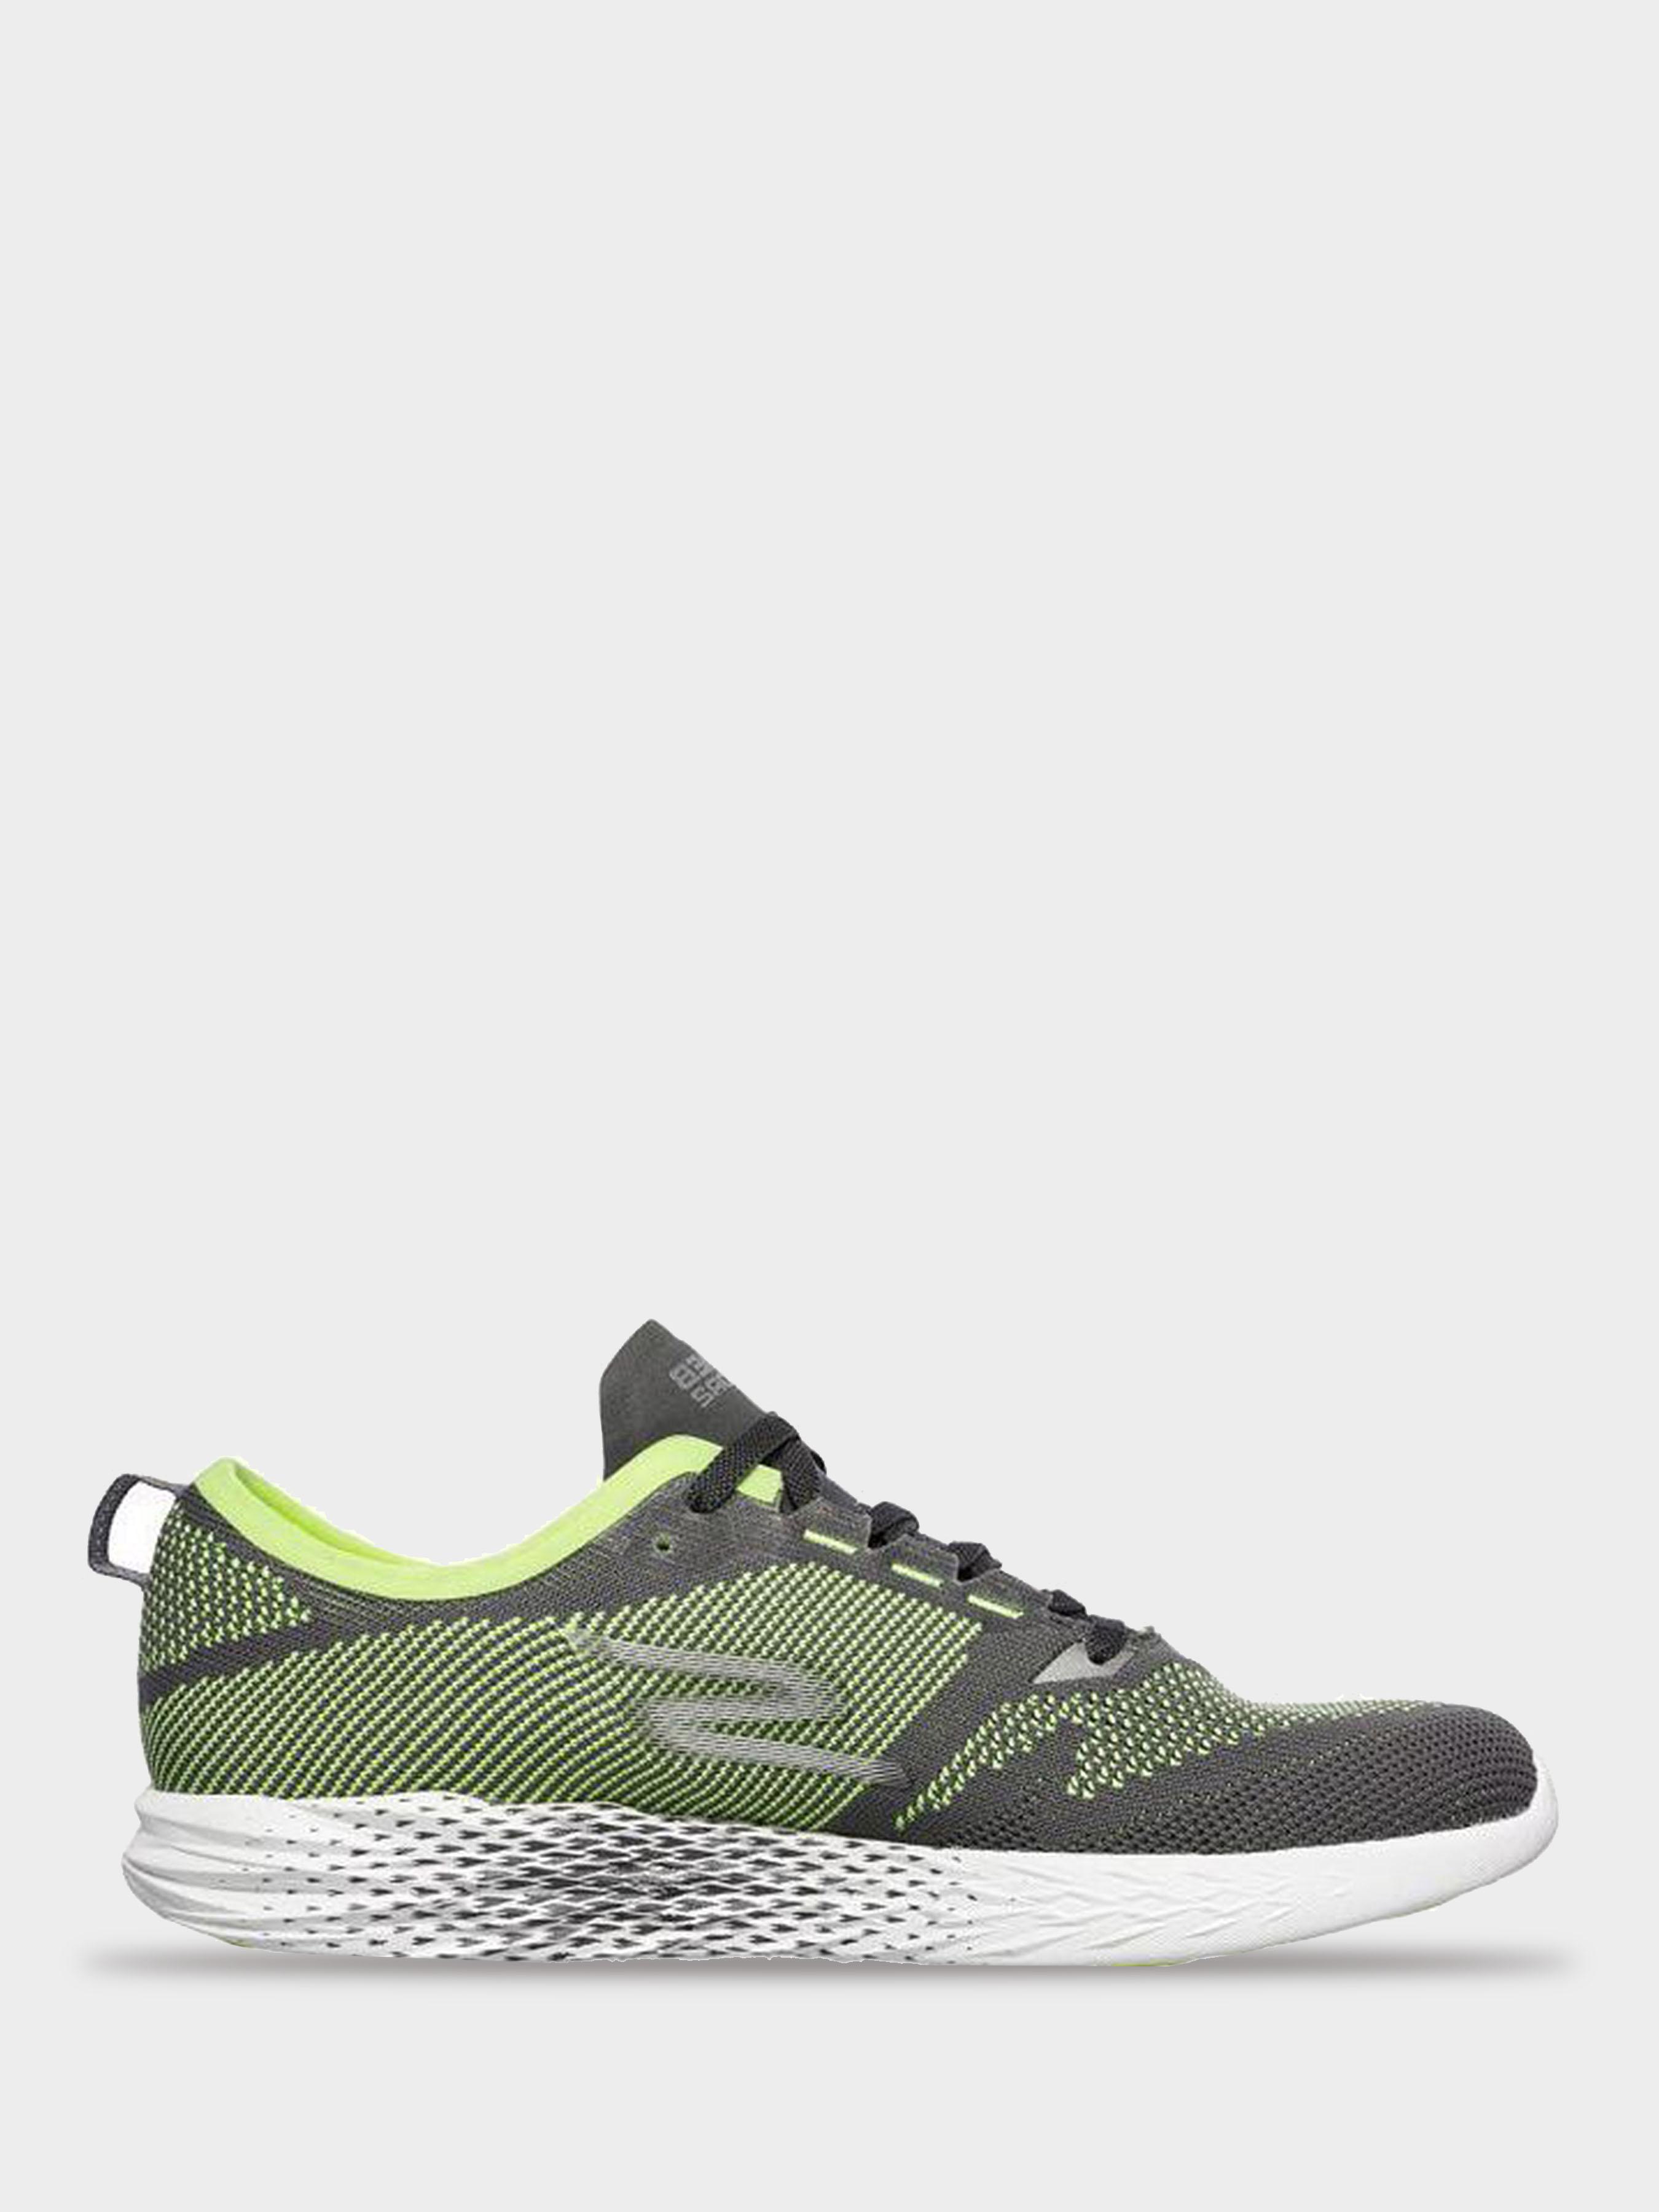 Кроссовки для мужчин Skechers GO KM2807 , 2017